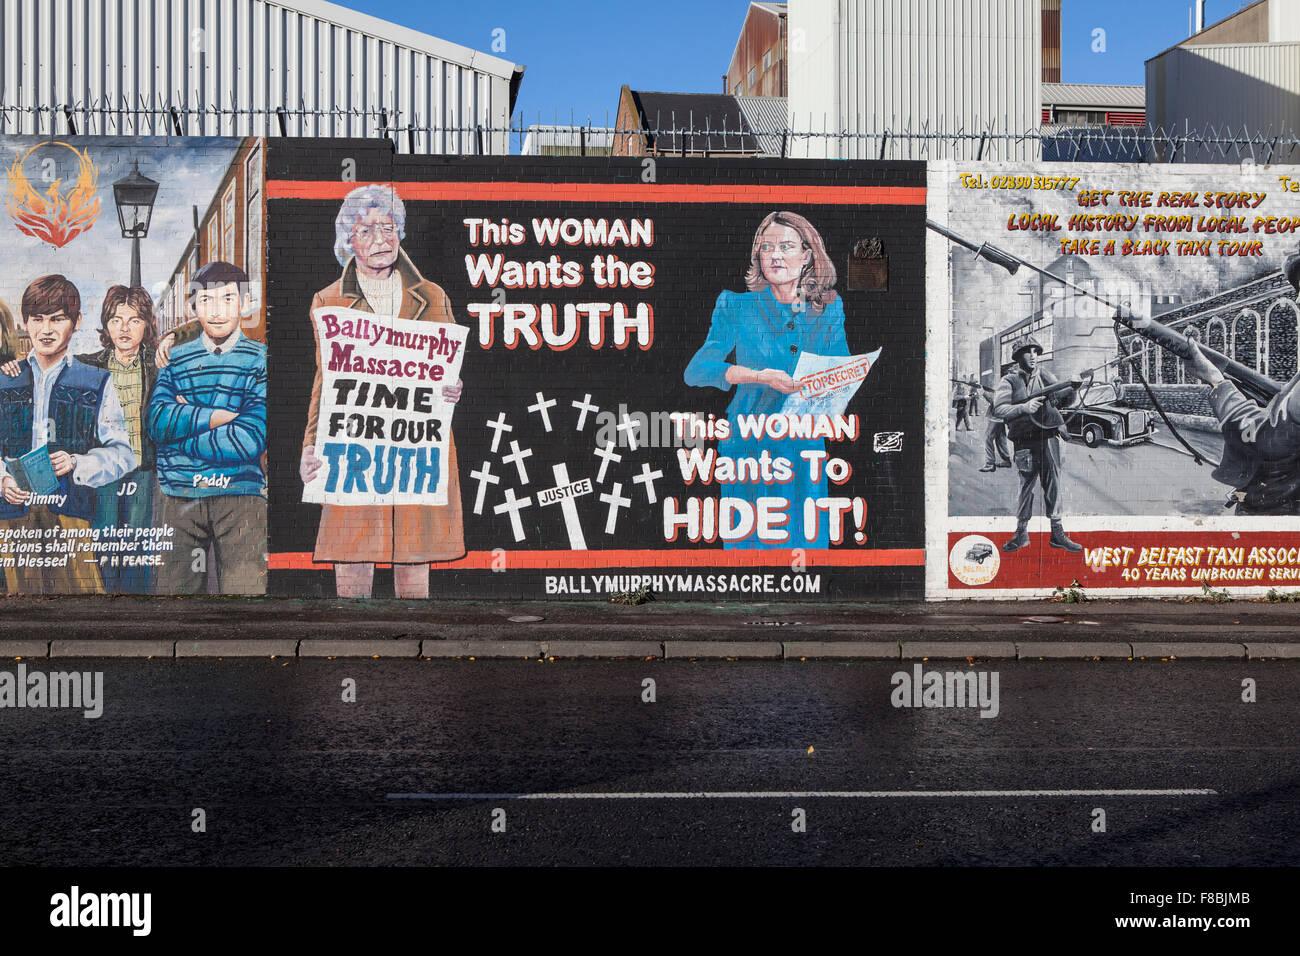 Grafitti, mural in West Belfast, Northern Ireland - Stock Image